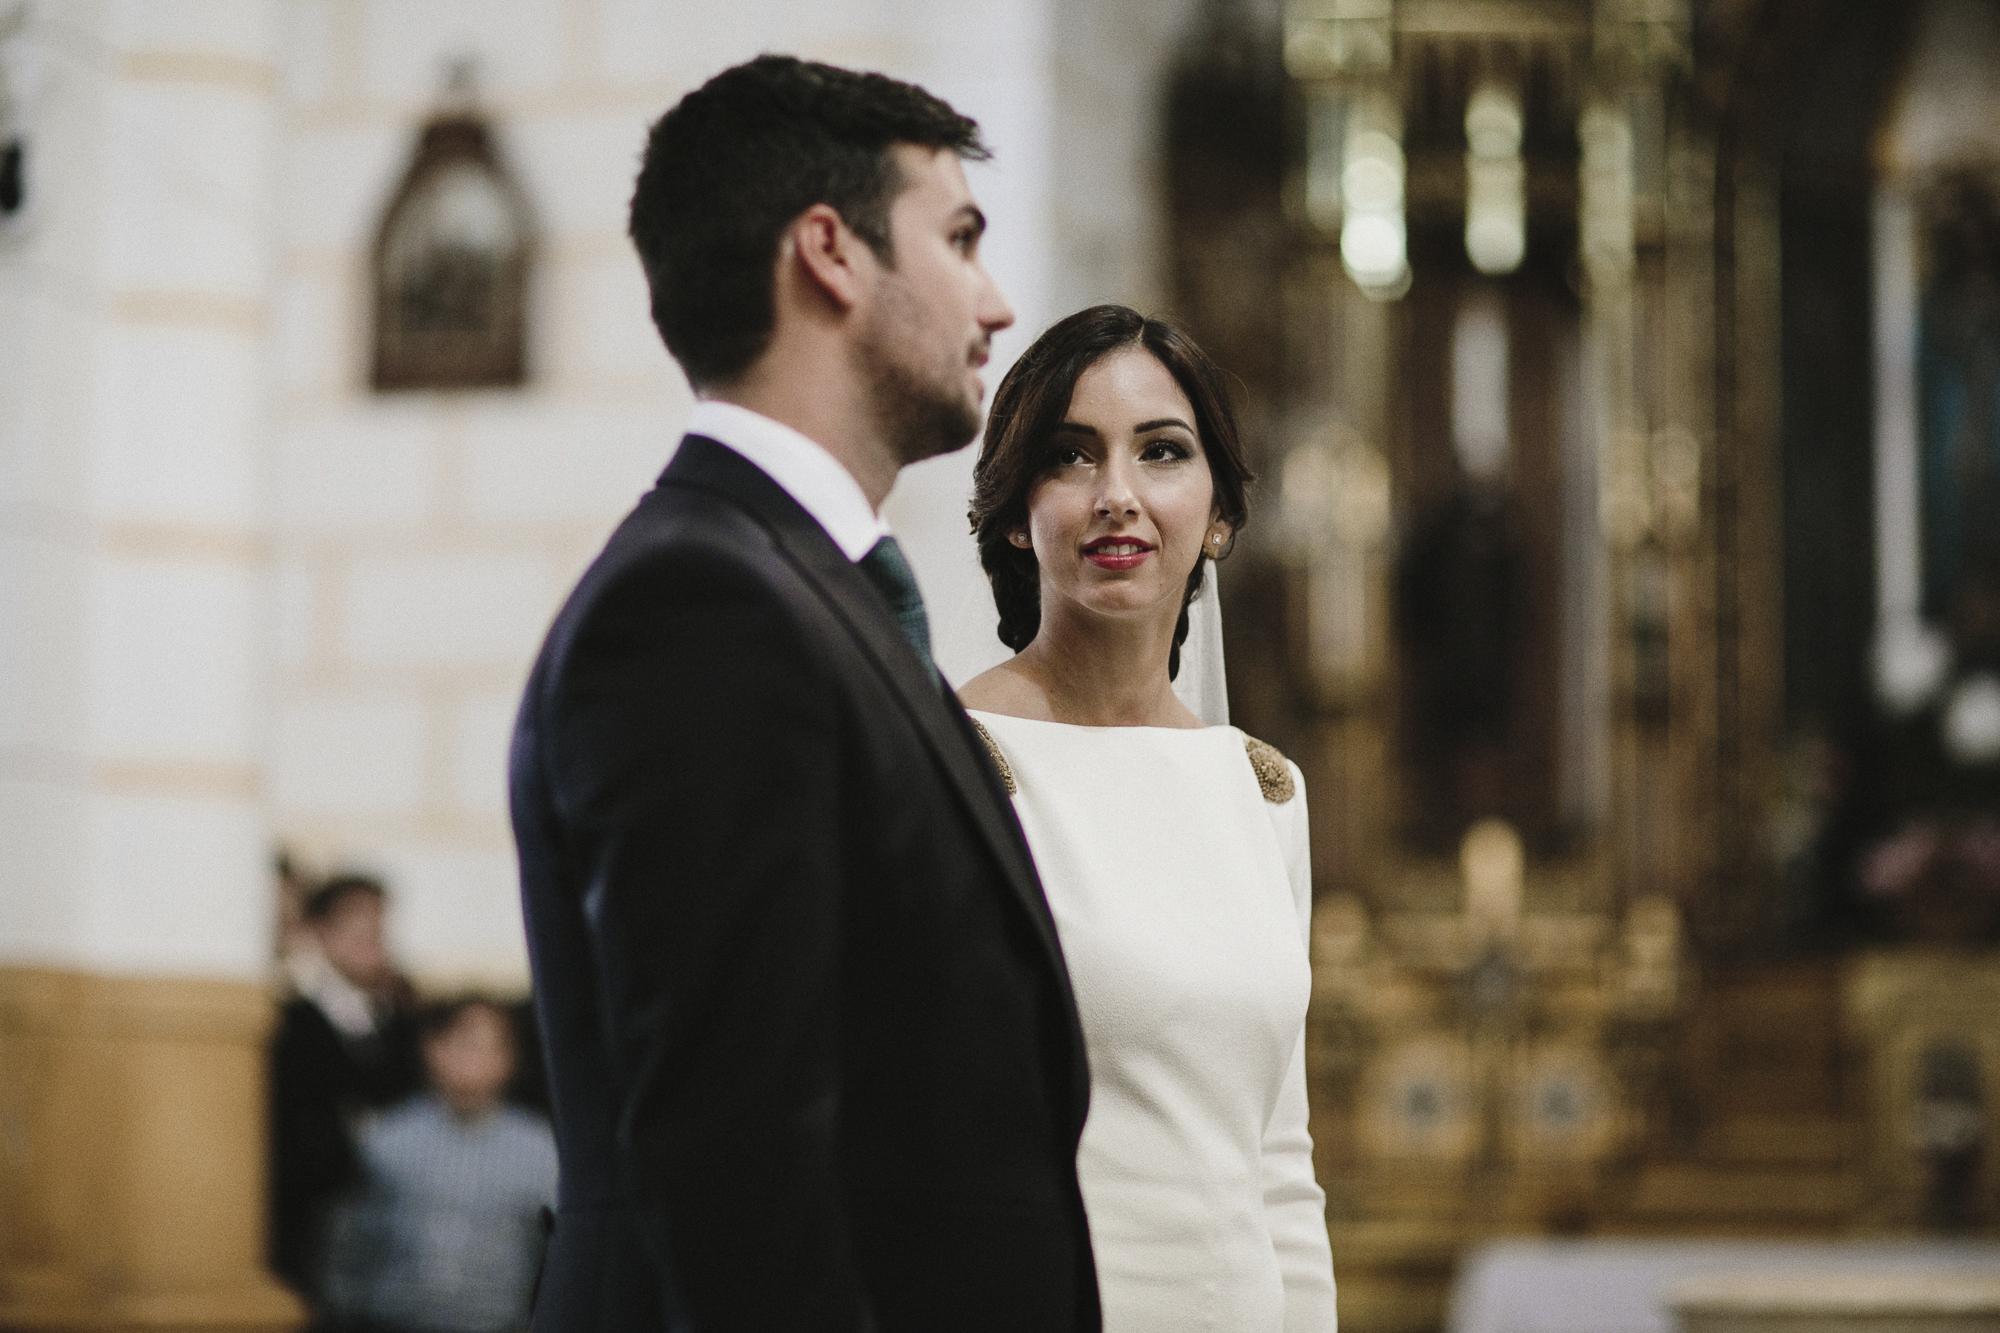 alfonso_flores_destination_wedding_photogrpaher_españa-55.jpg